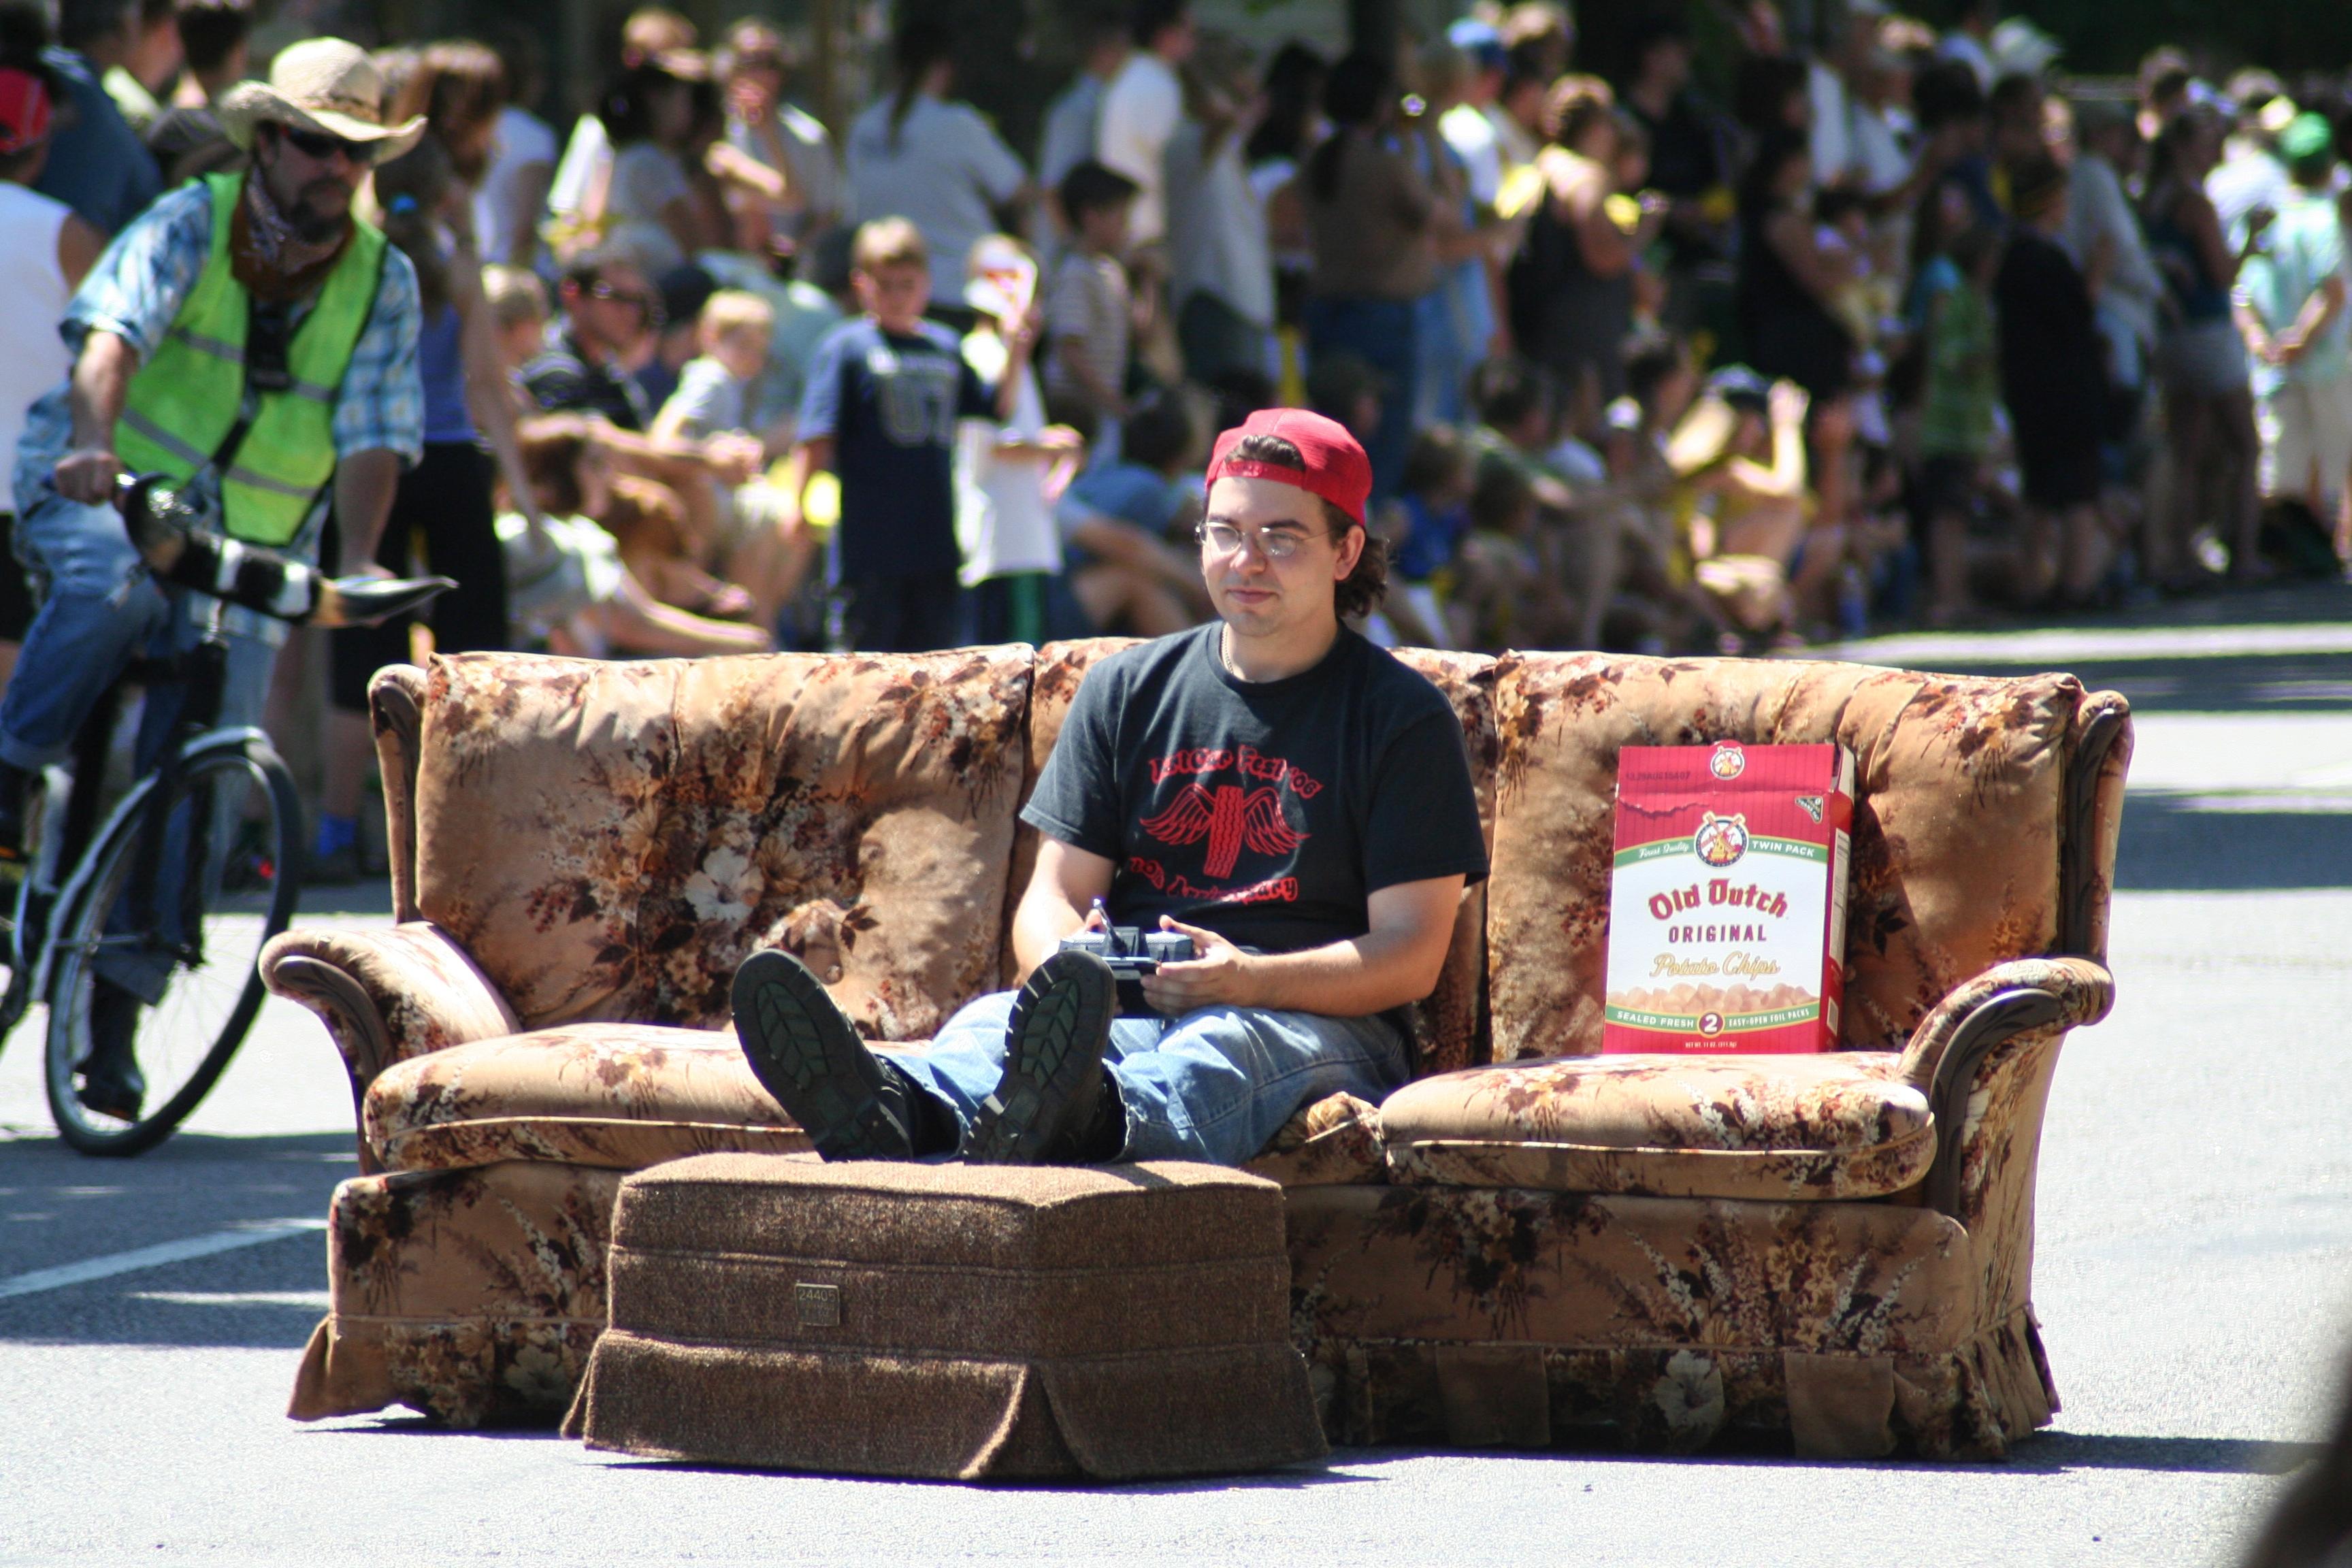 File:Couch Car @ Minneapolis Art Car Parade (870290100)